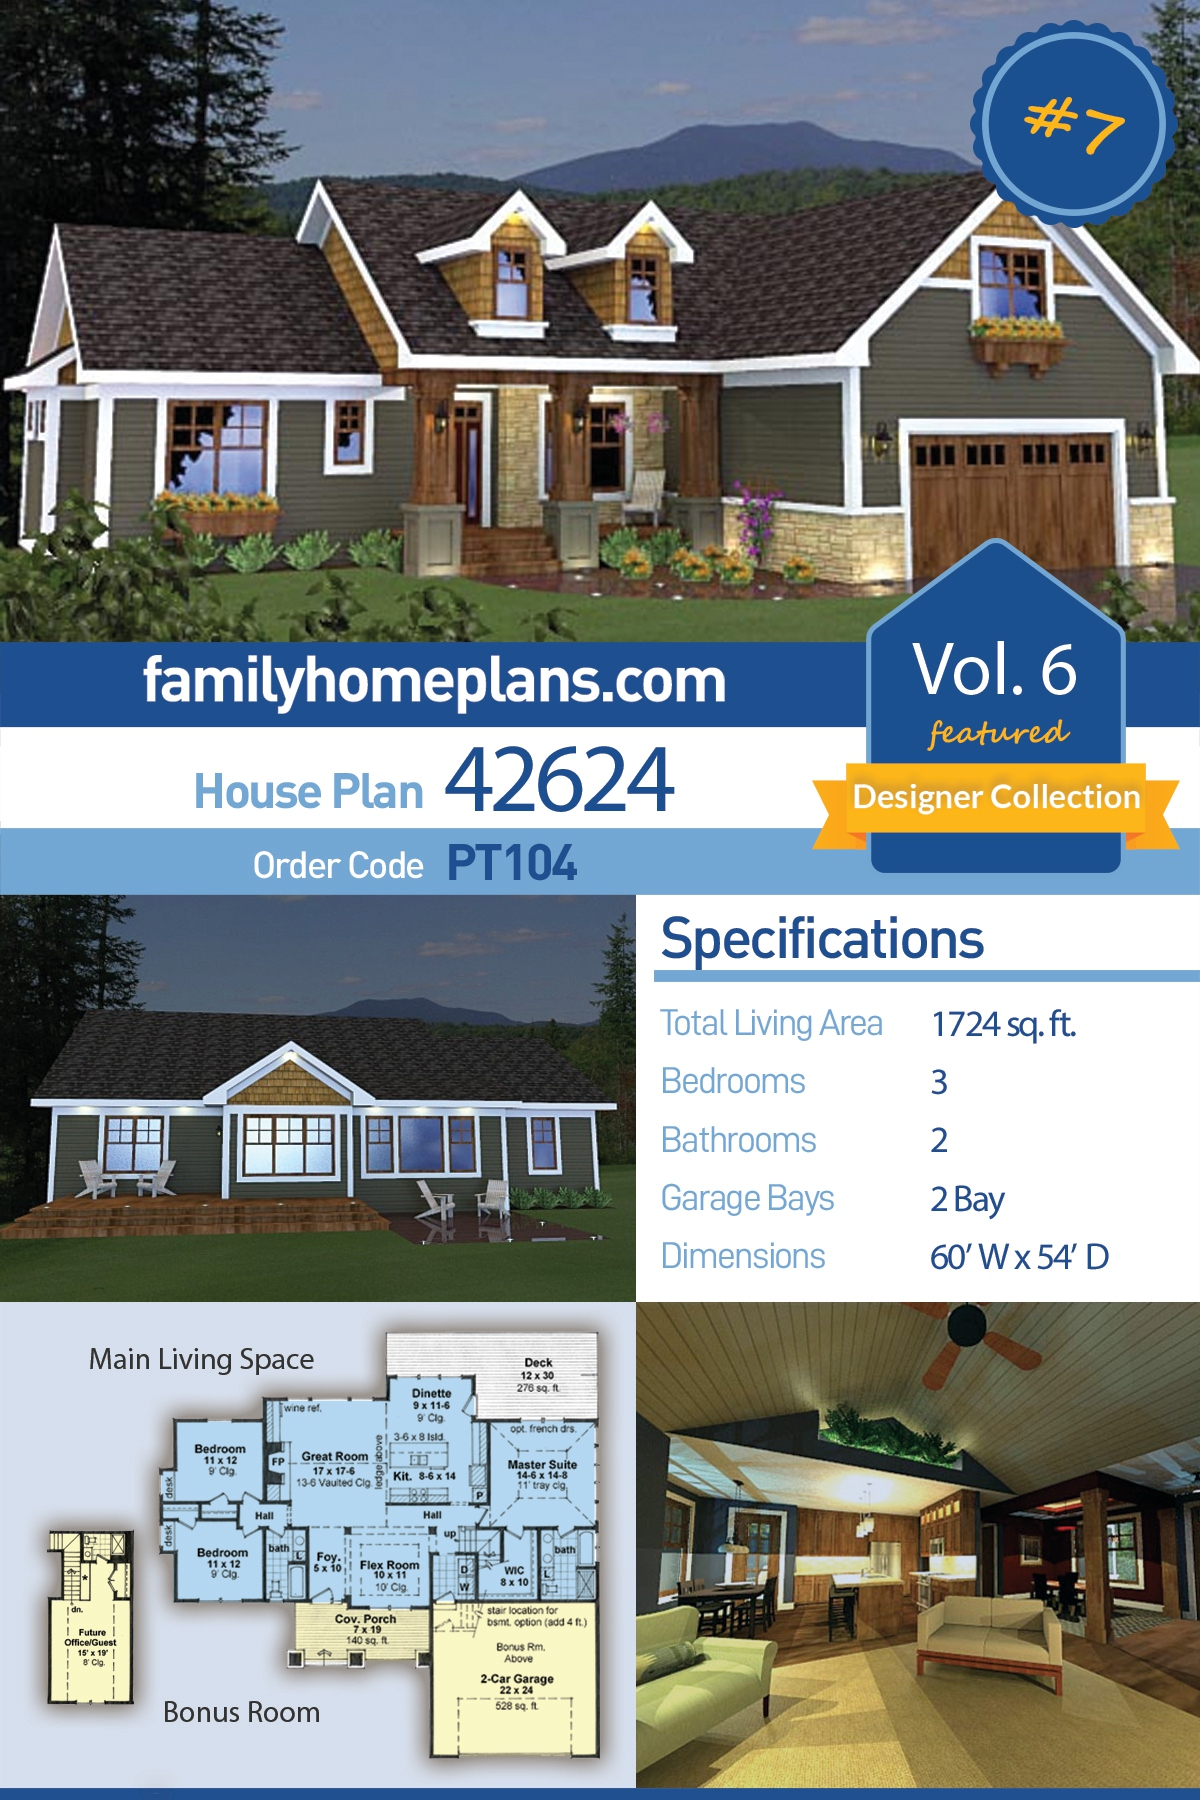 Craftsman House Plan 42624 with 3 Beds, 2 Baths, 2 Car Garage